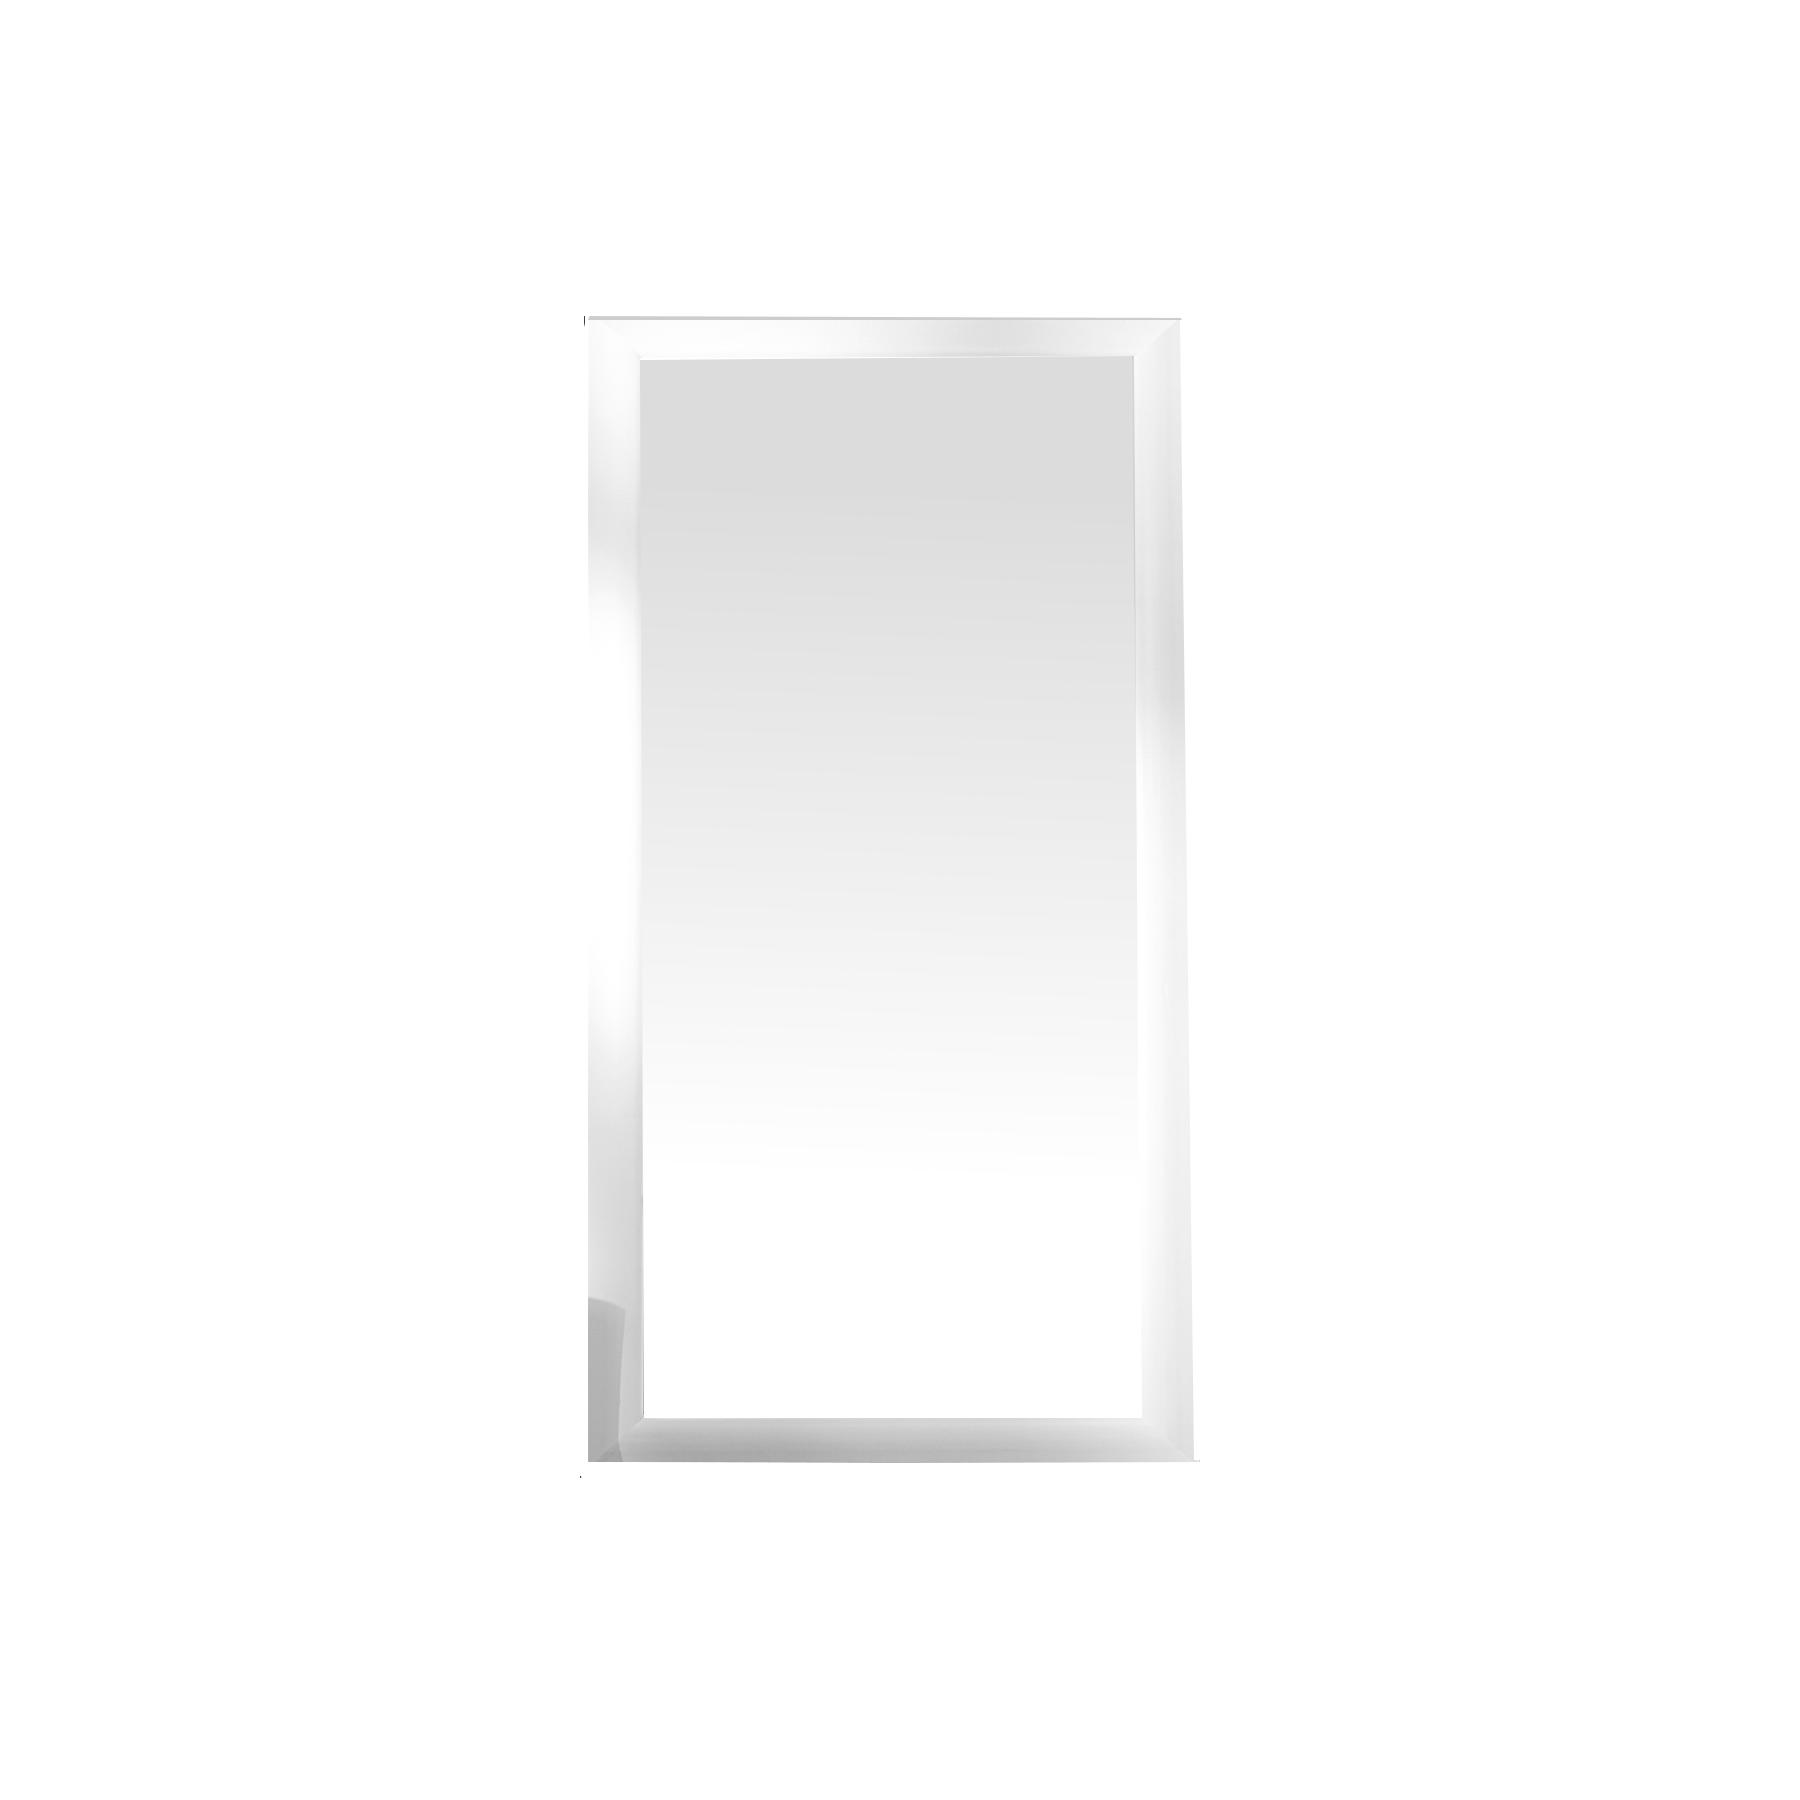 gro er design spiegel espejo weiss matt 180x85 cm wandspiegel badspiegel ebay. Black Bedroom Furniture Sets. Home Design Ideas